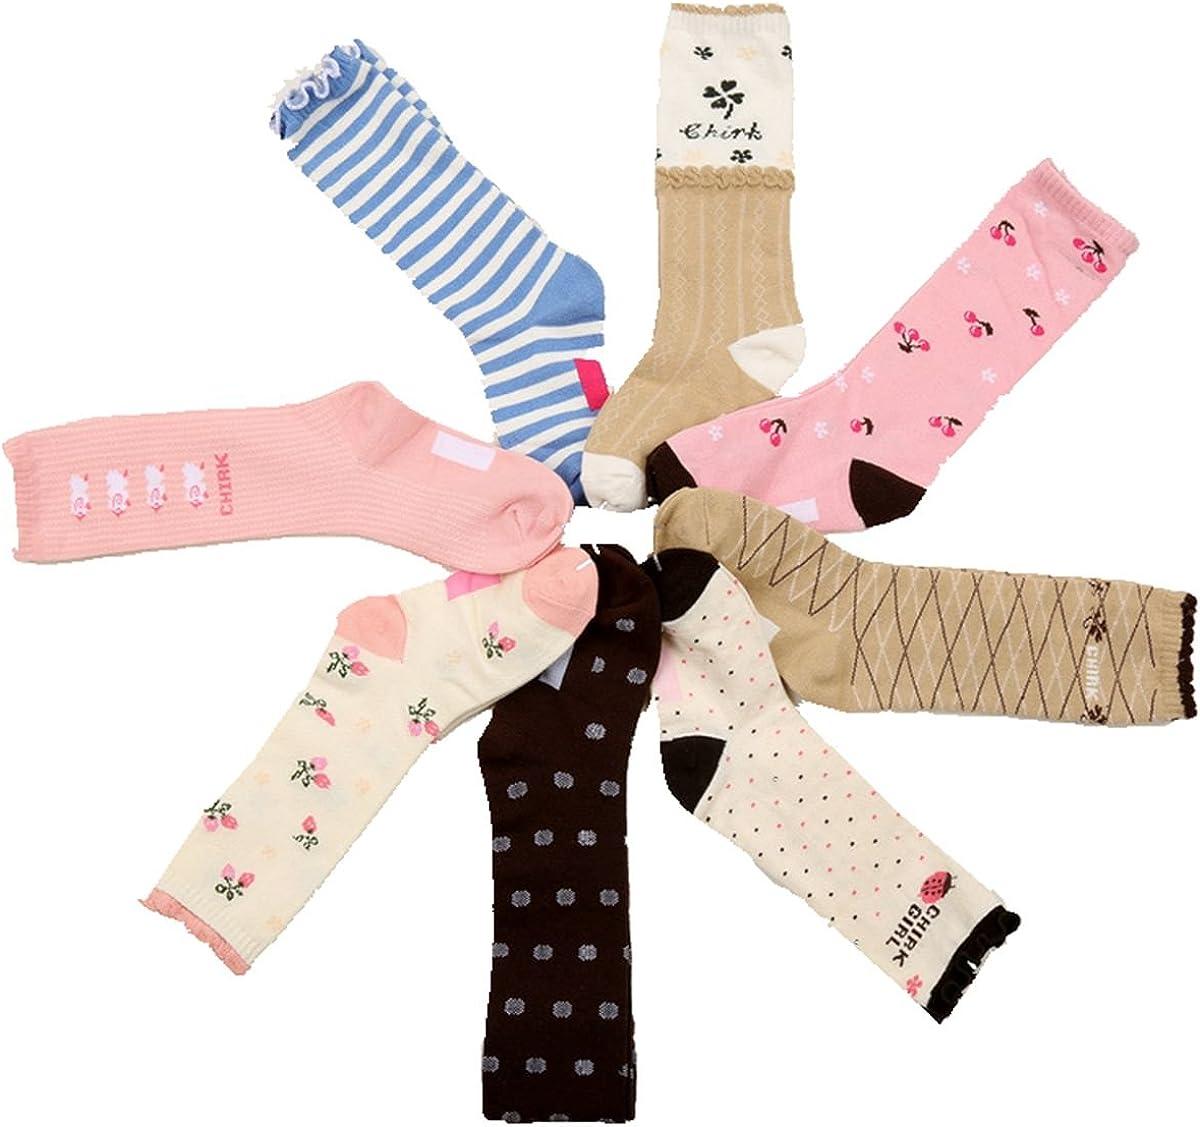 Girls Knee High Tube Socks Cartoon Cherry Comfort Cotton Stockings Socks 8 Pair Pack